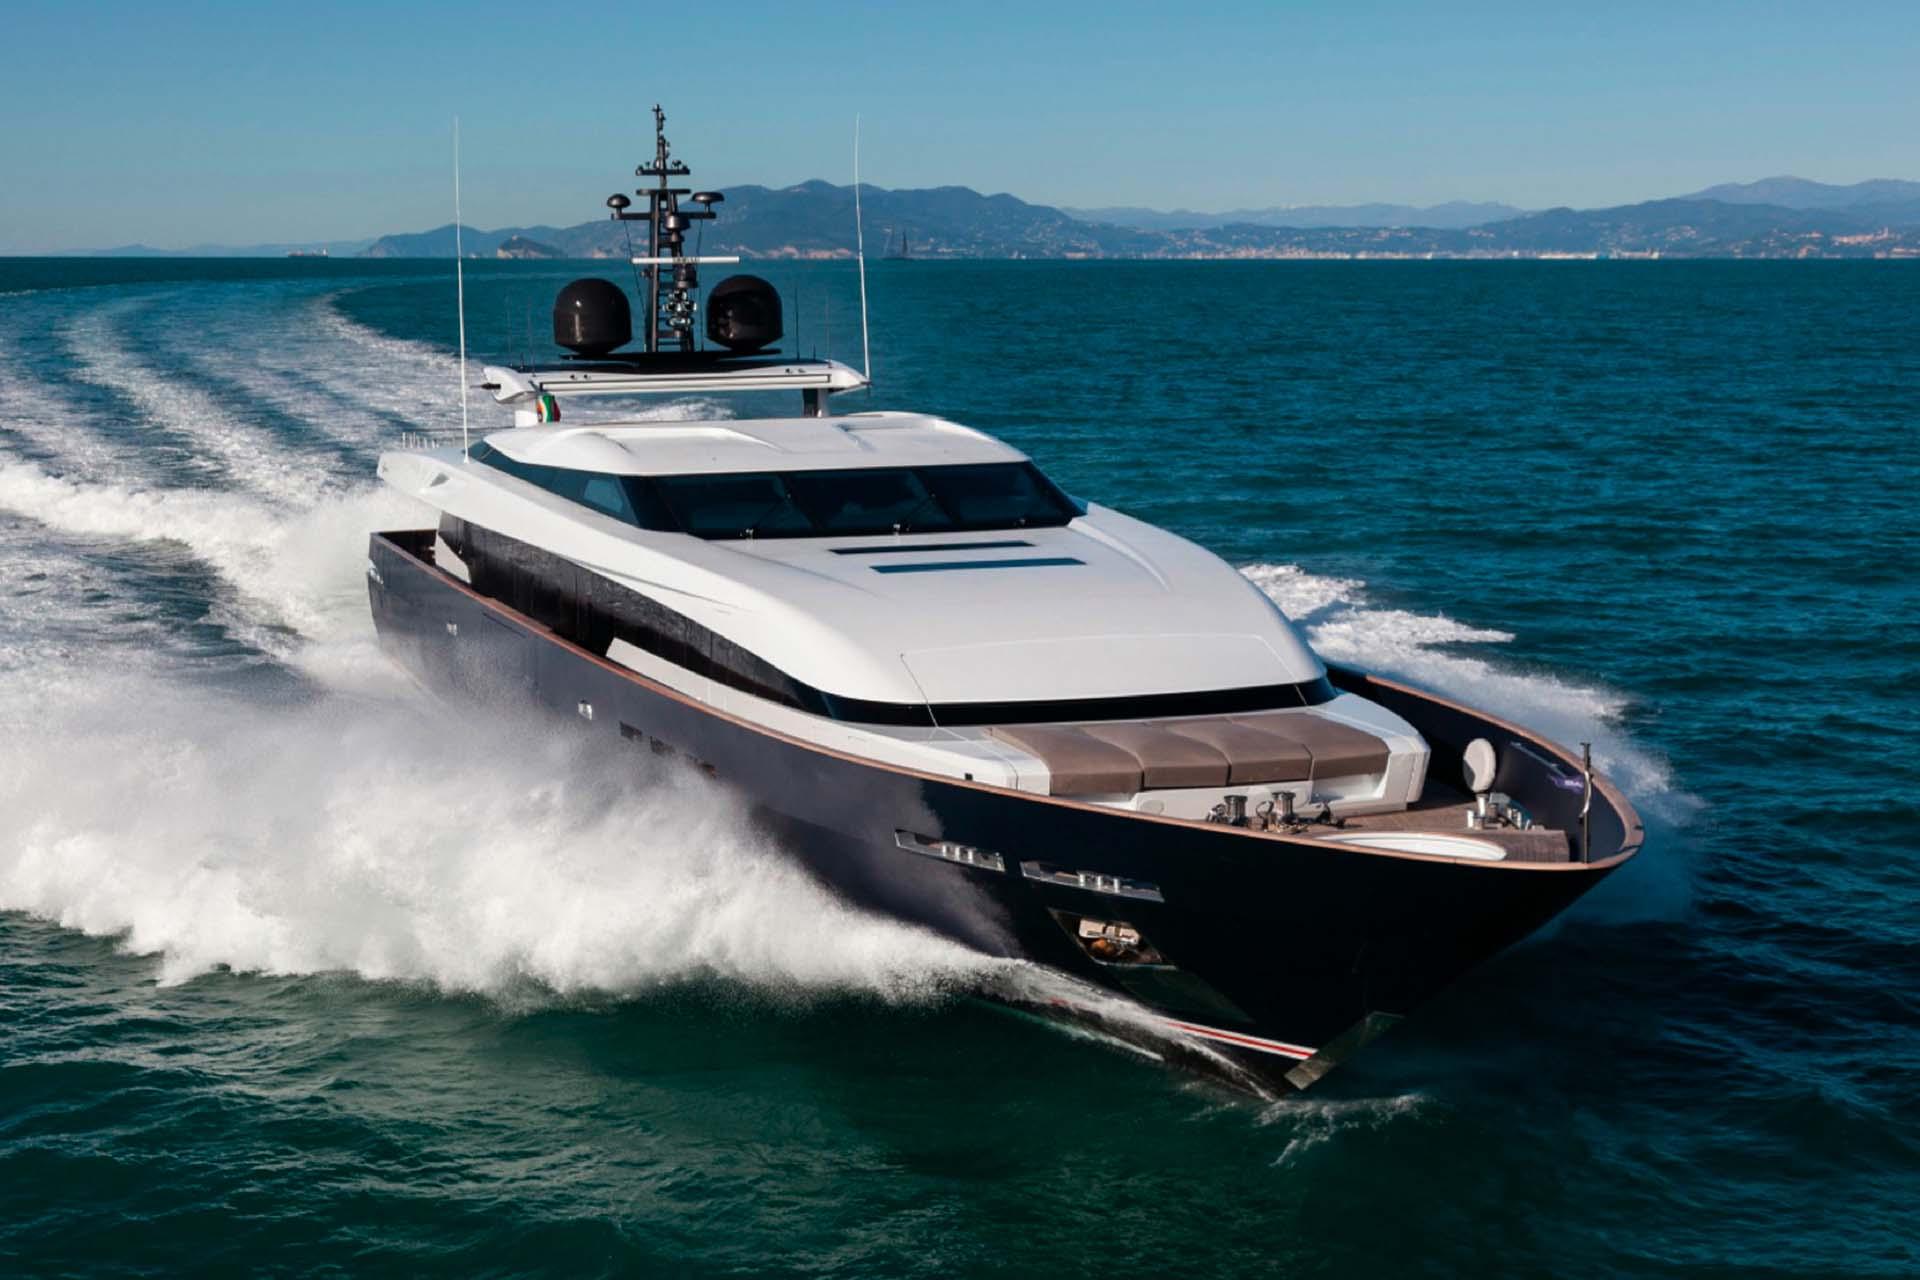 baglietto - PACHAMAMA - Paskowsky Yacht Design